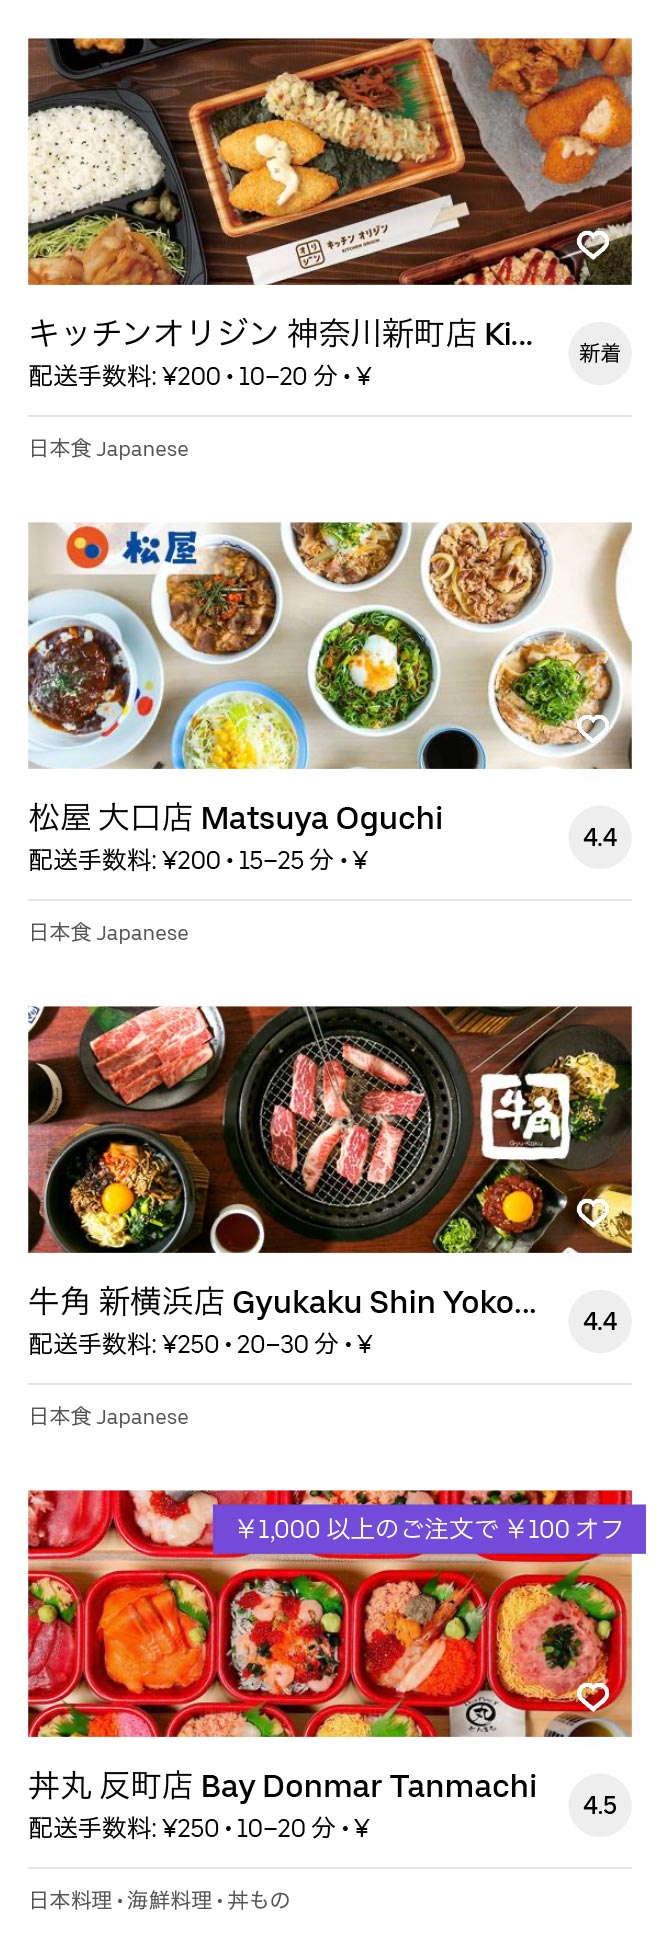 Yokohama hakuraku menu 2004 09